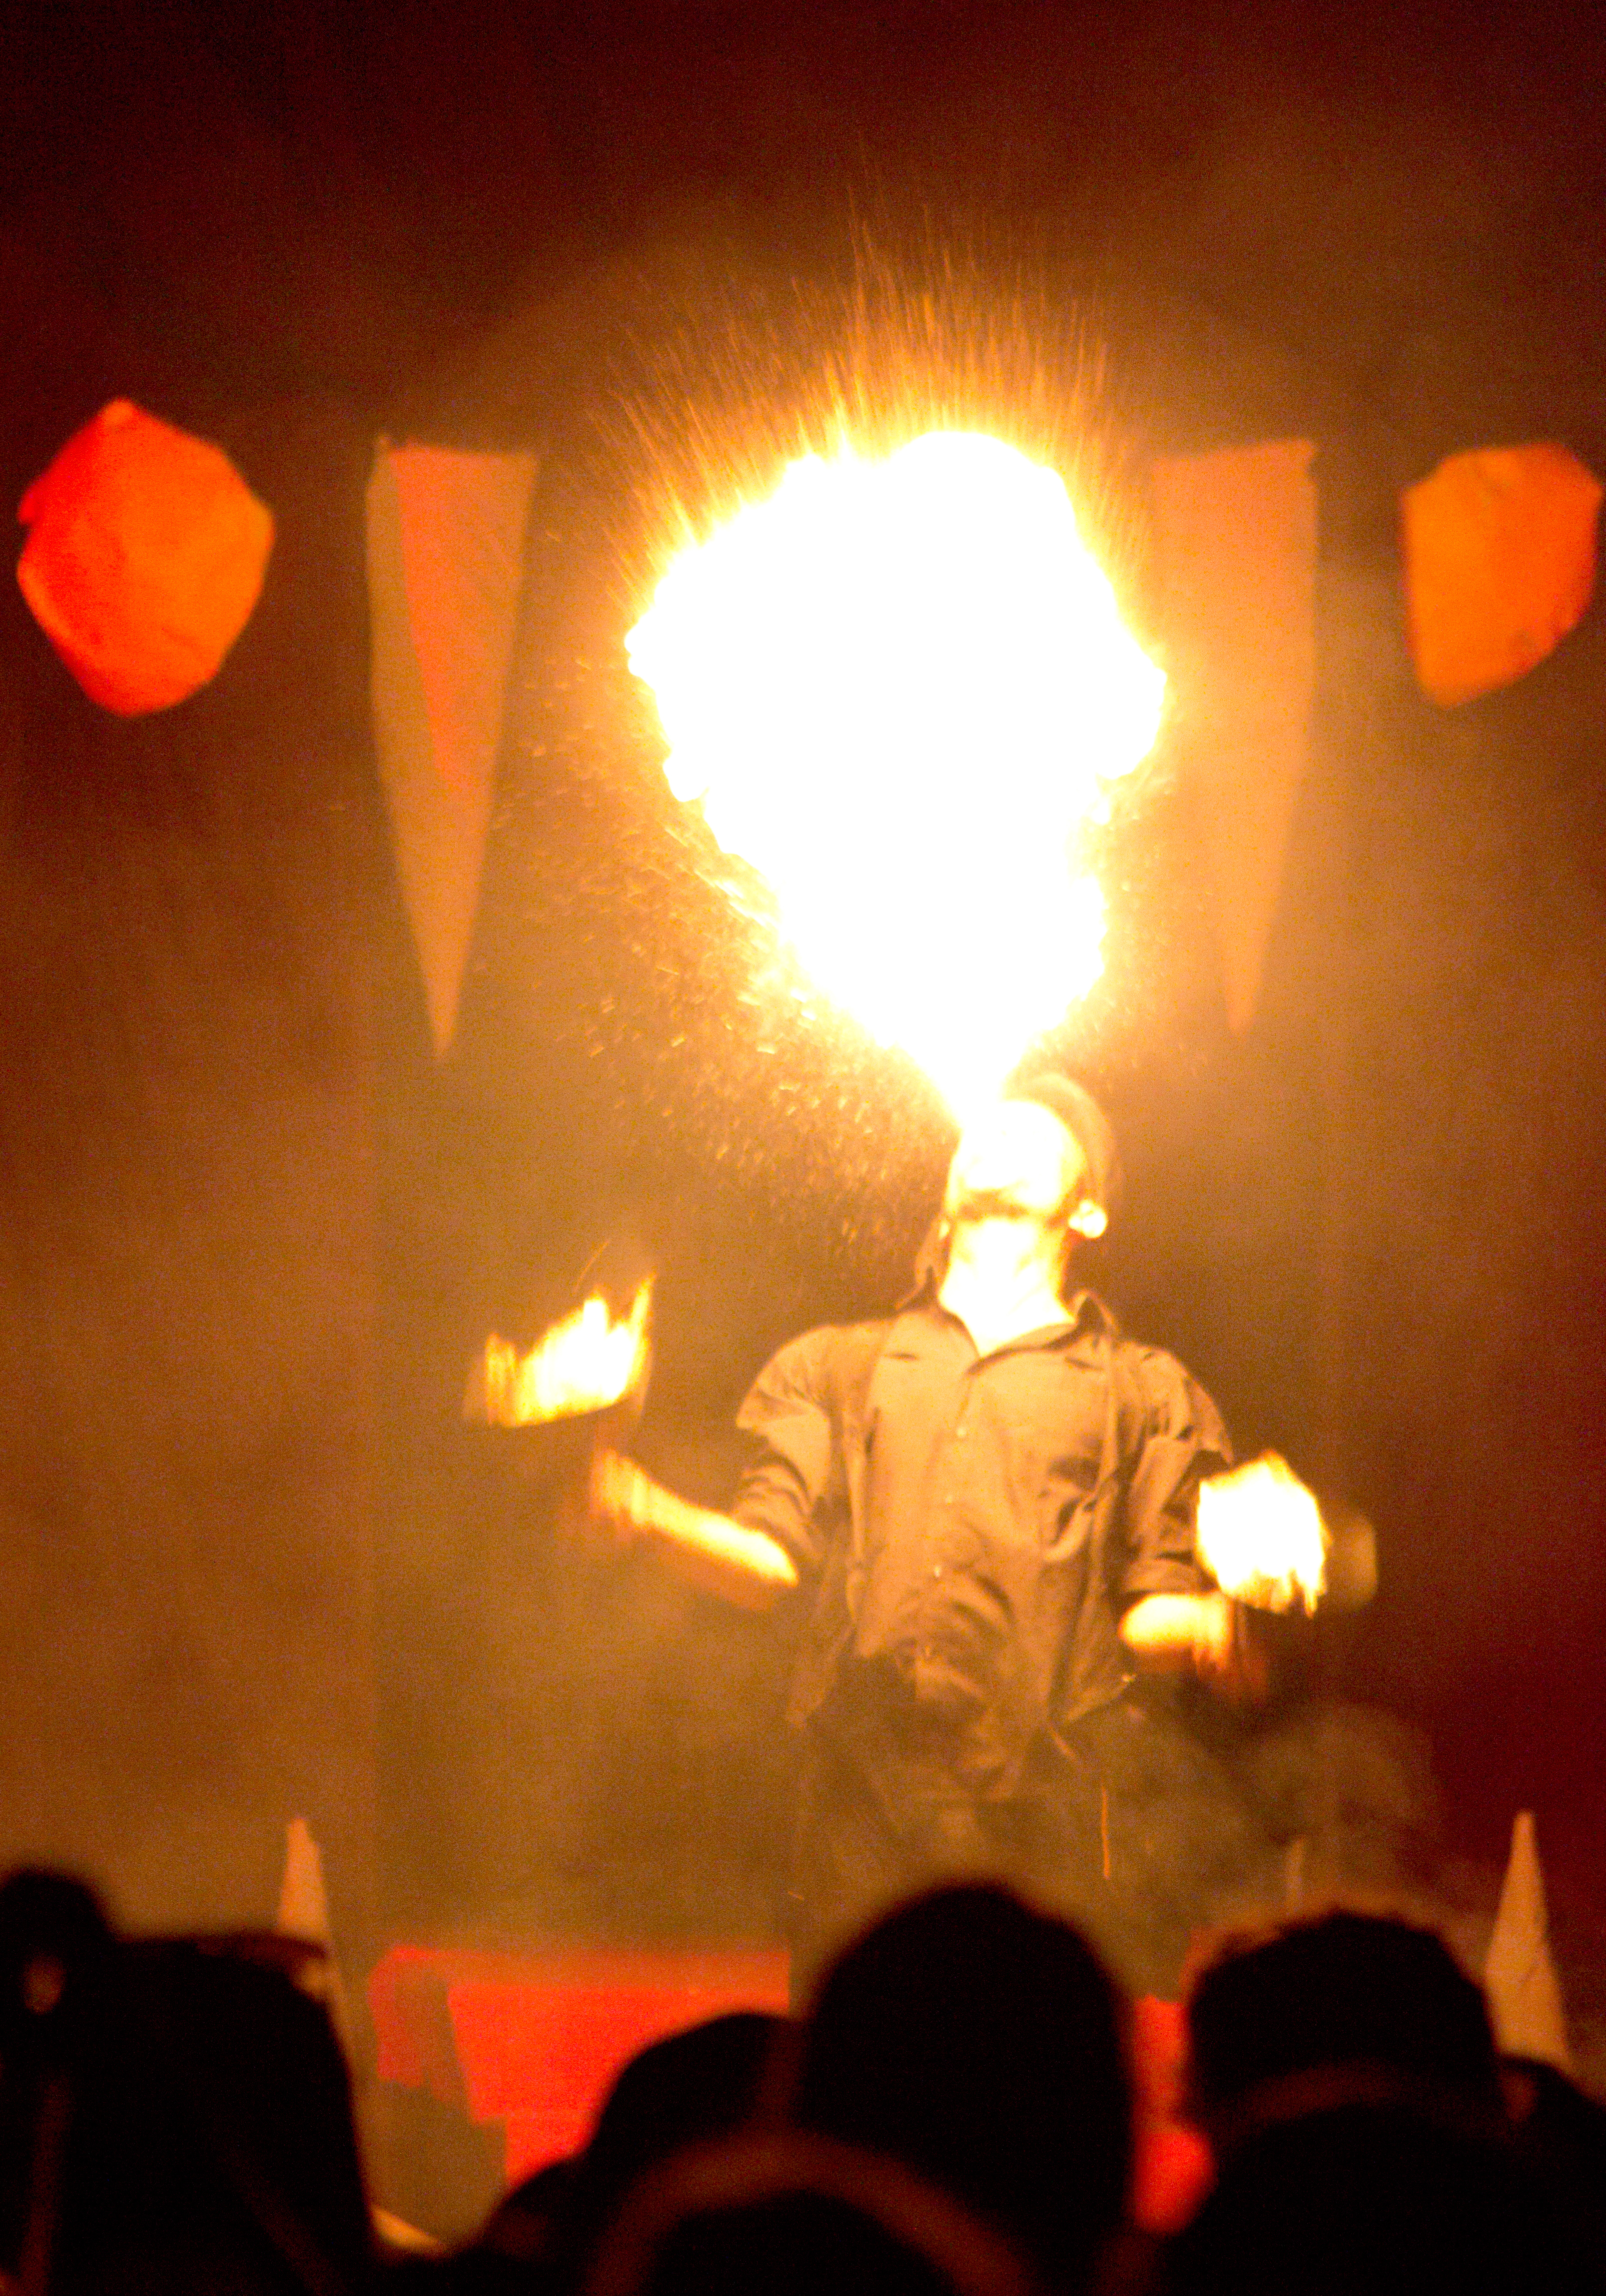 EJC 2013 day 6 - Thursday: Fire Gala.